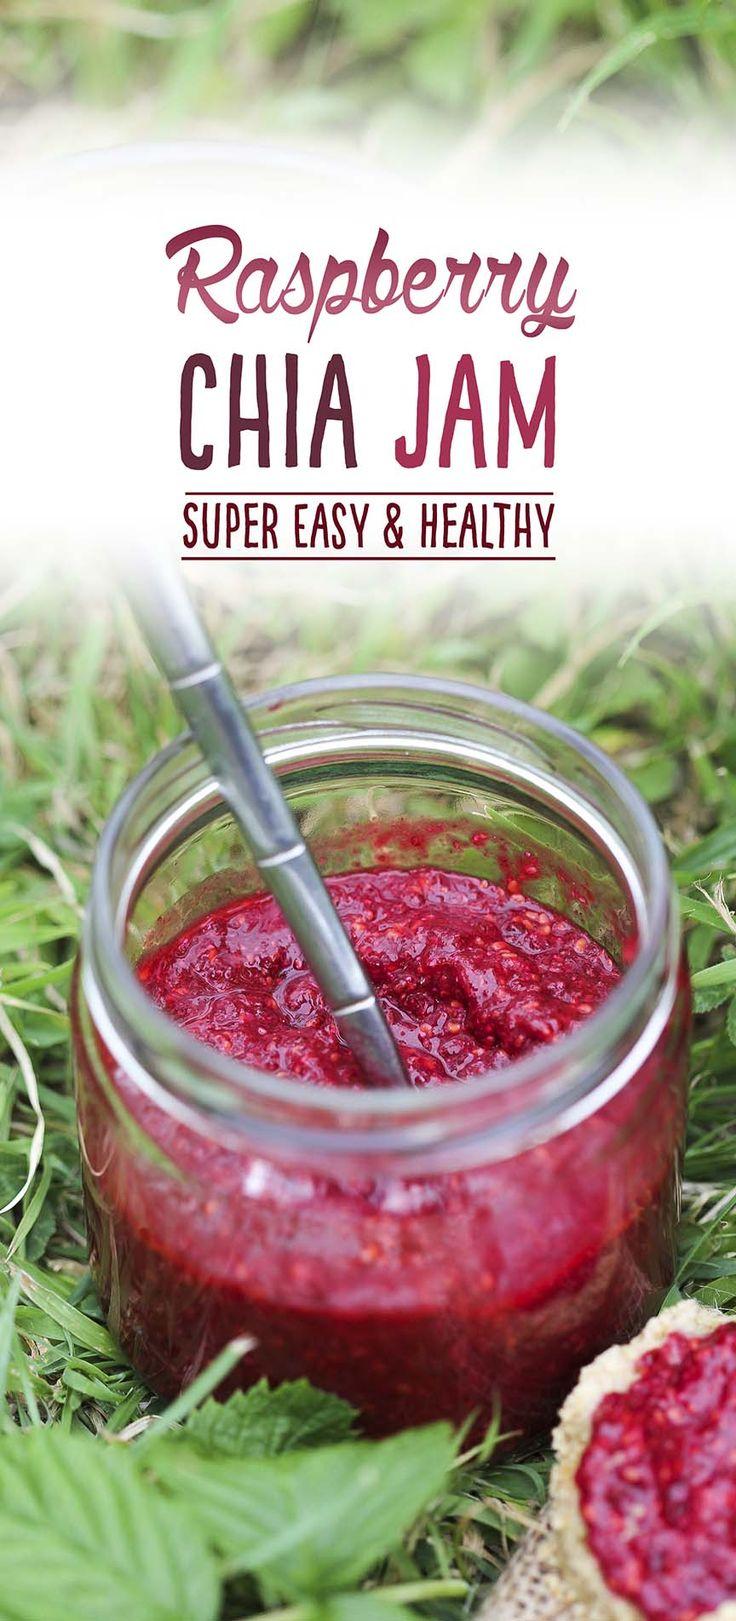 chia recipes, healthy recipes, vegan recipes, chia jam